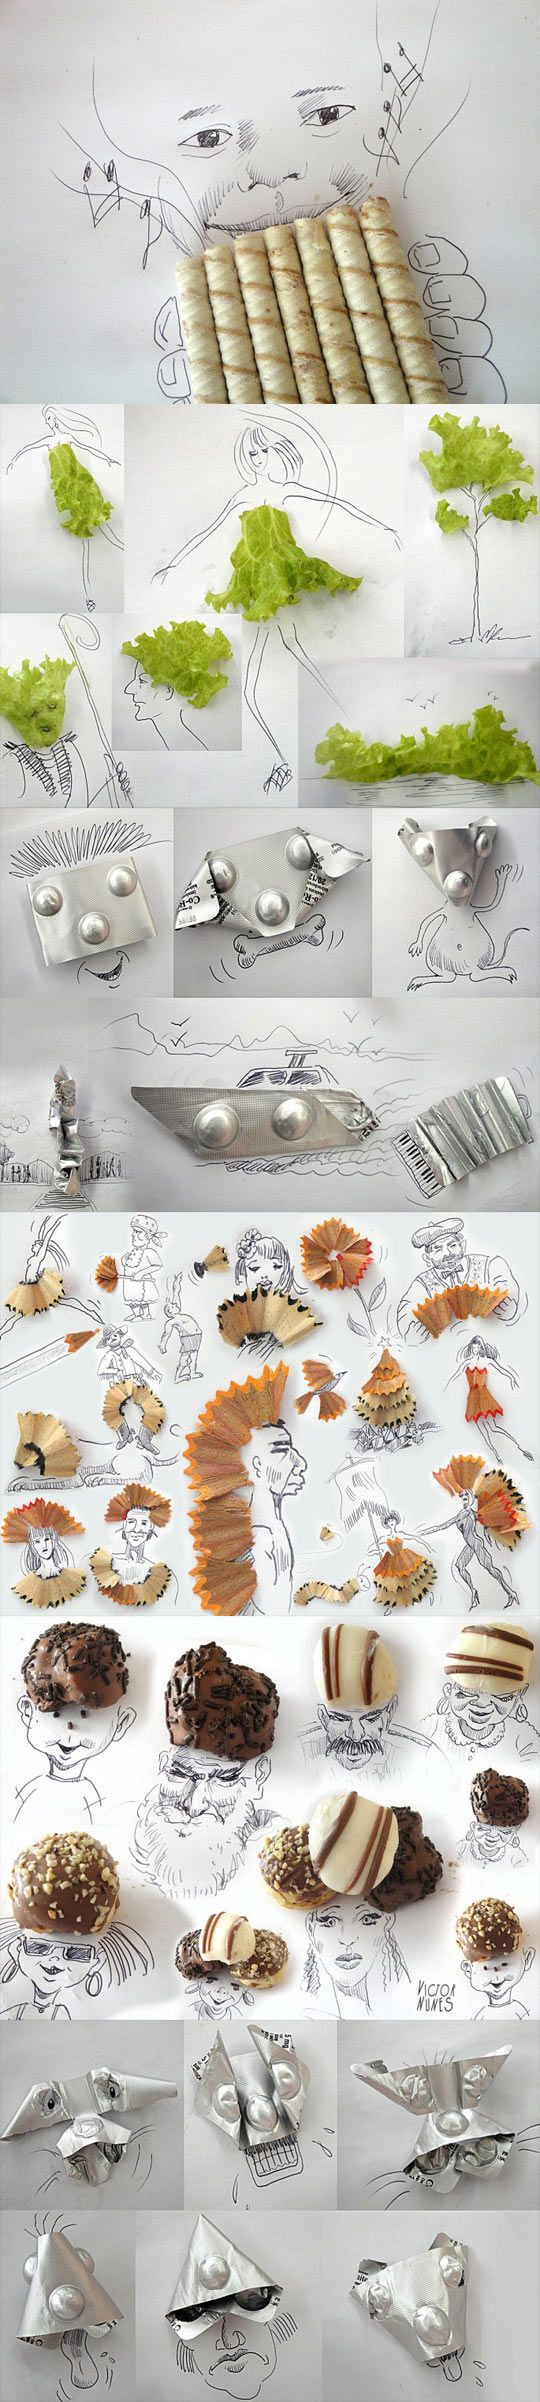 funny-drawing-popcorn-scissors-coffee-mugs-nuts-pen